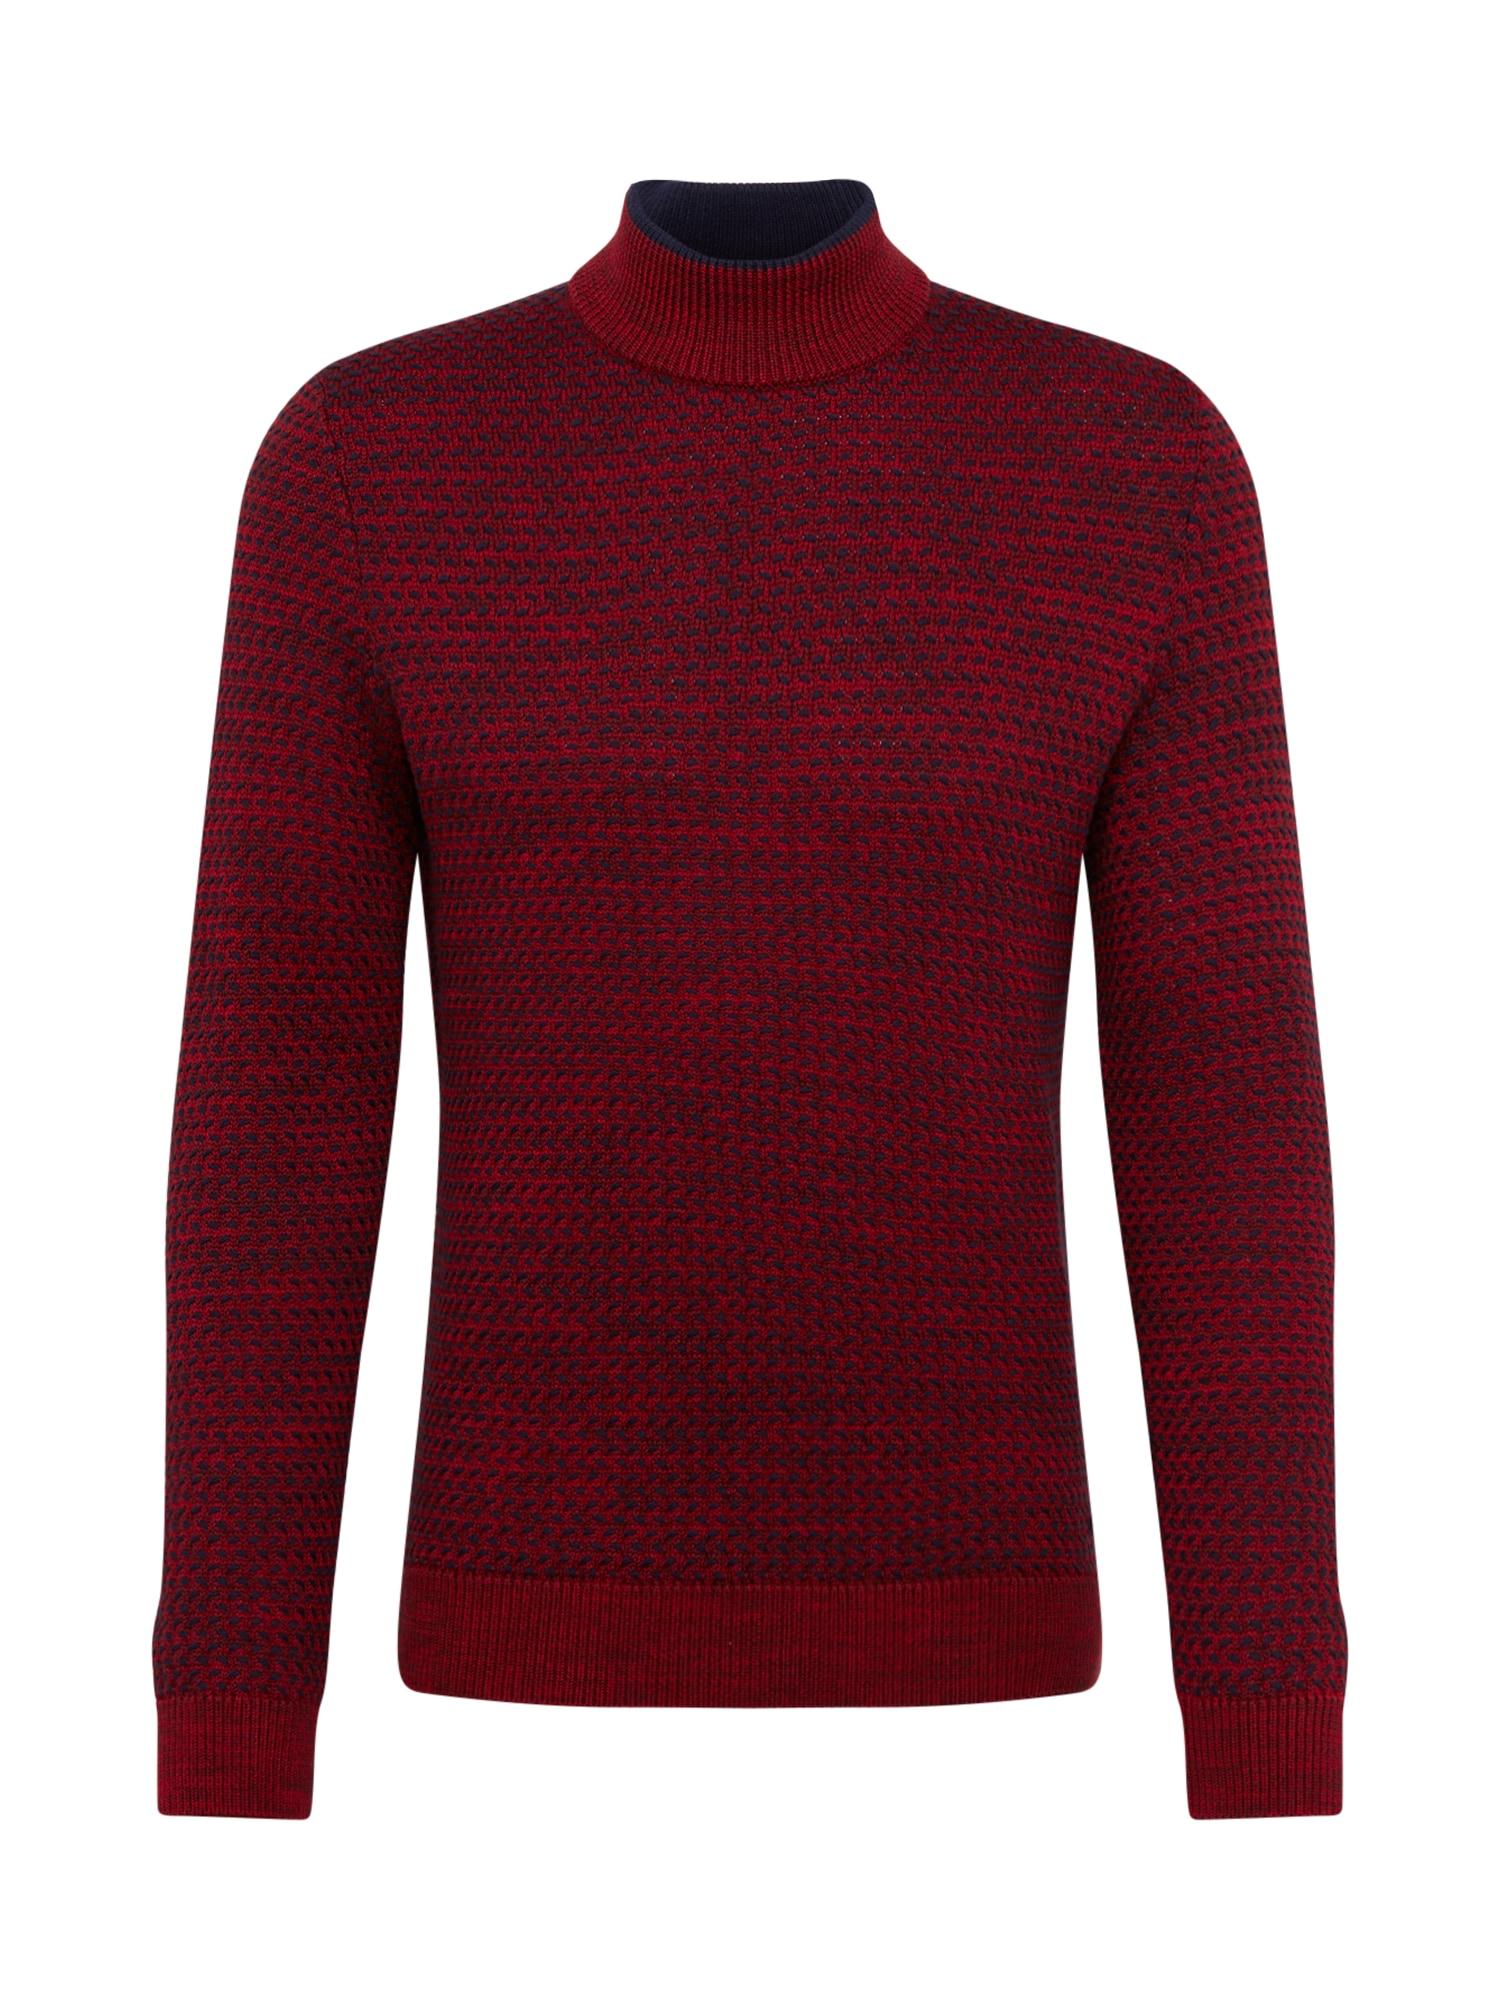 BOSS Megztinis 'Klepton' raudona